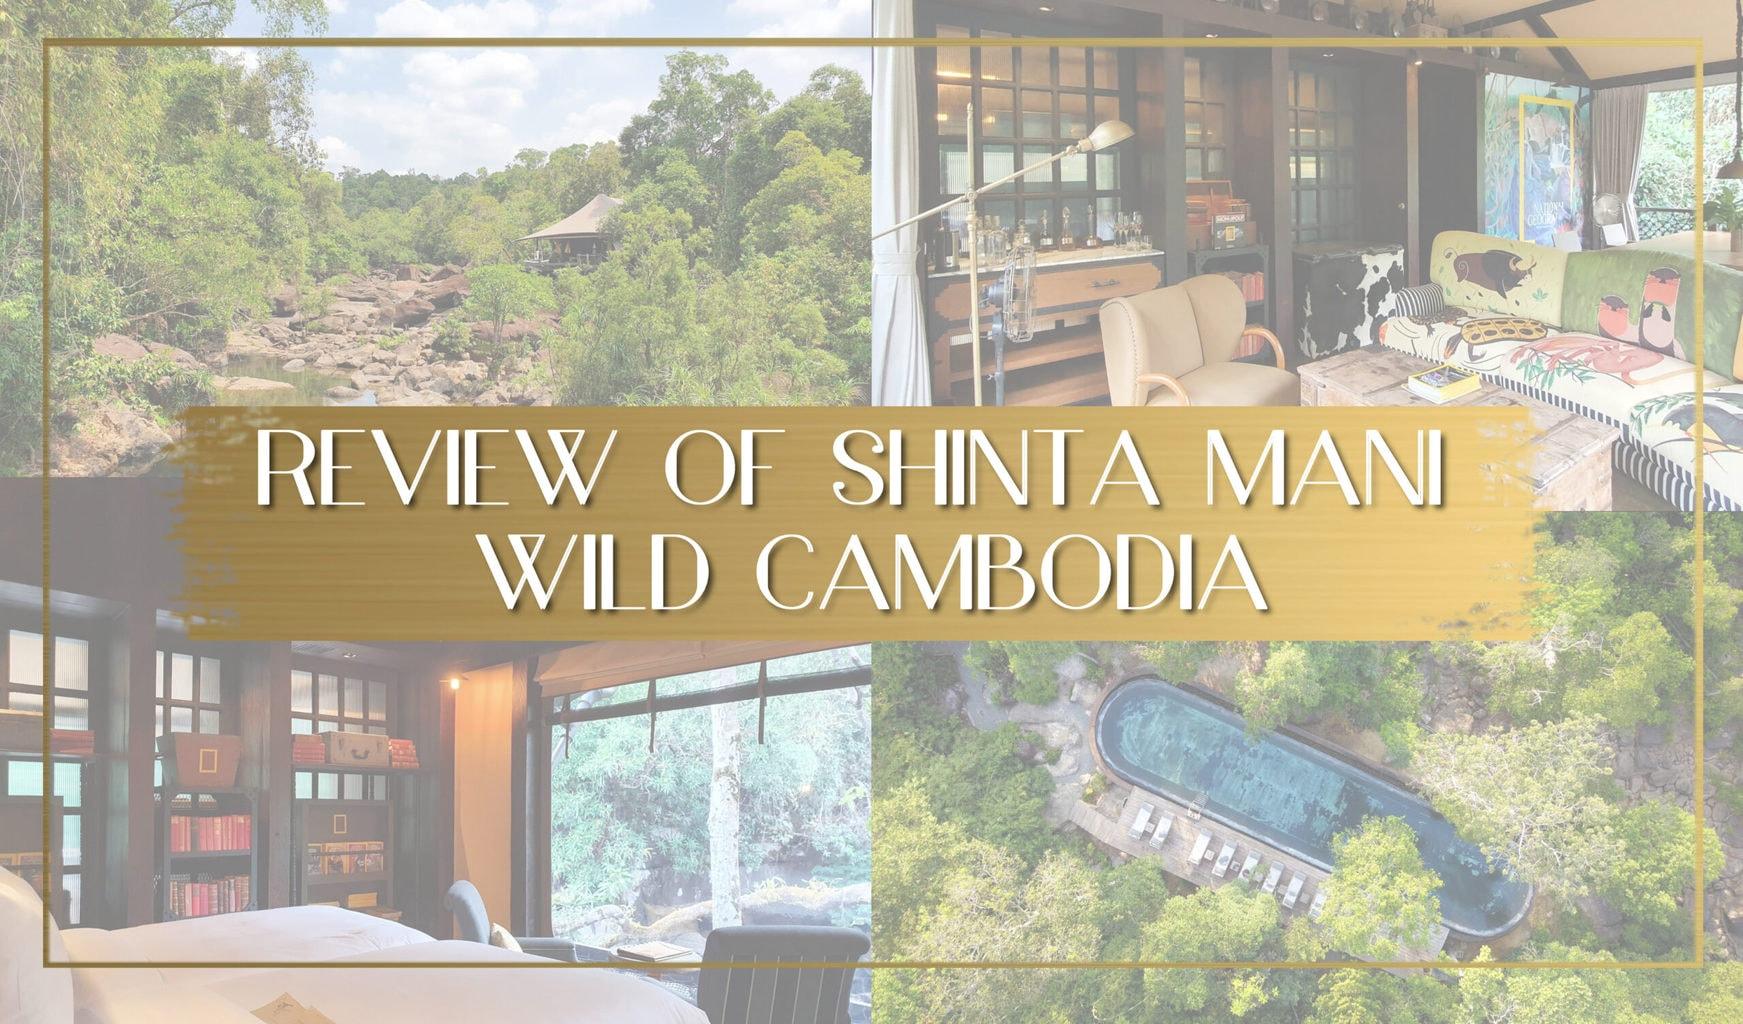 Review of Shinta Mani Wild Cambodia main